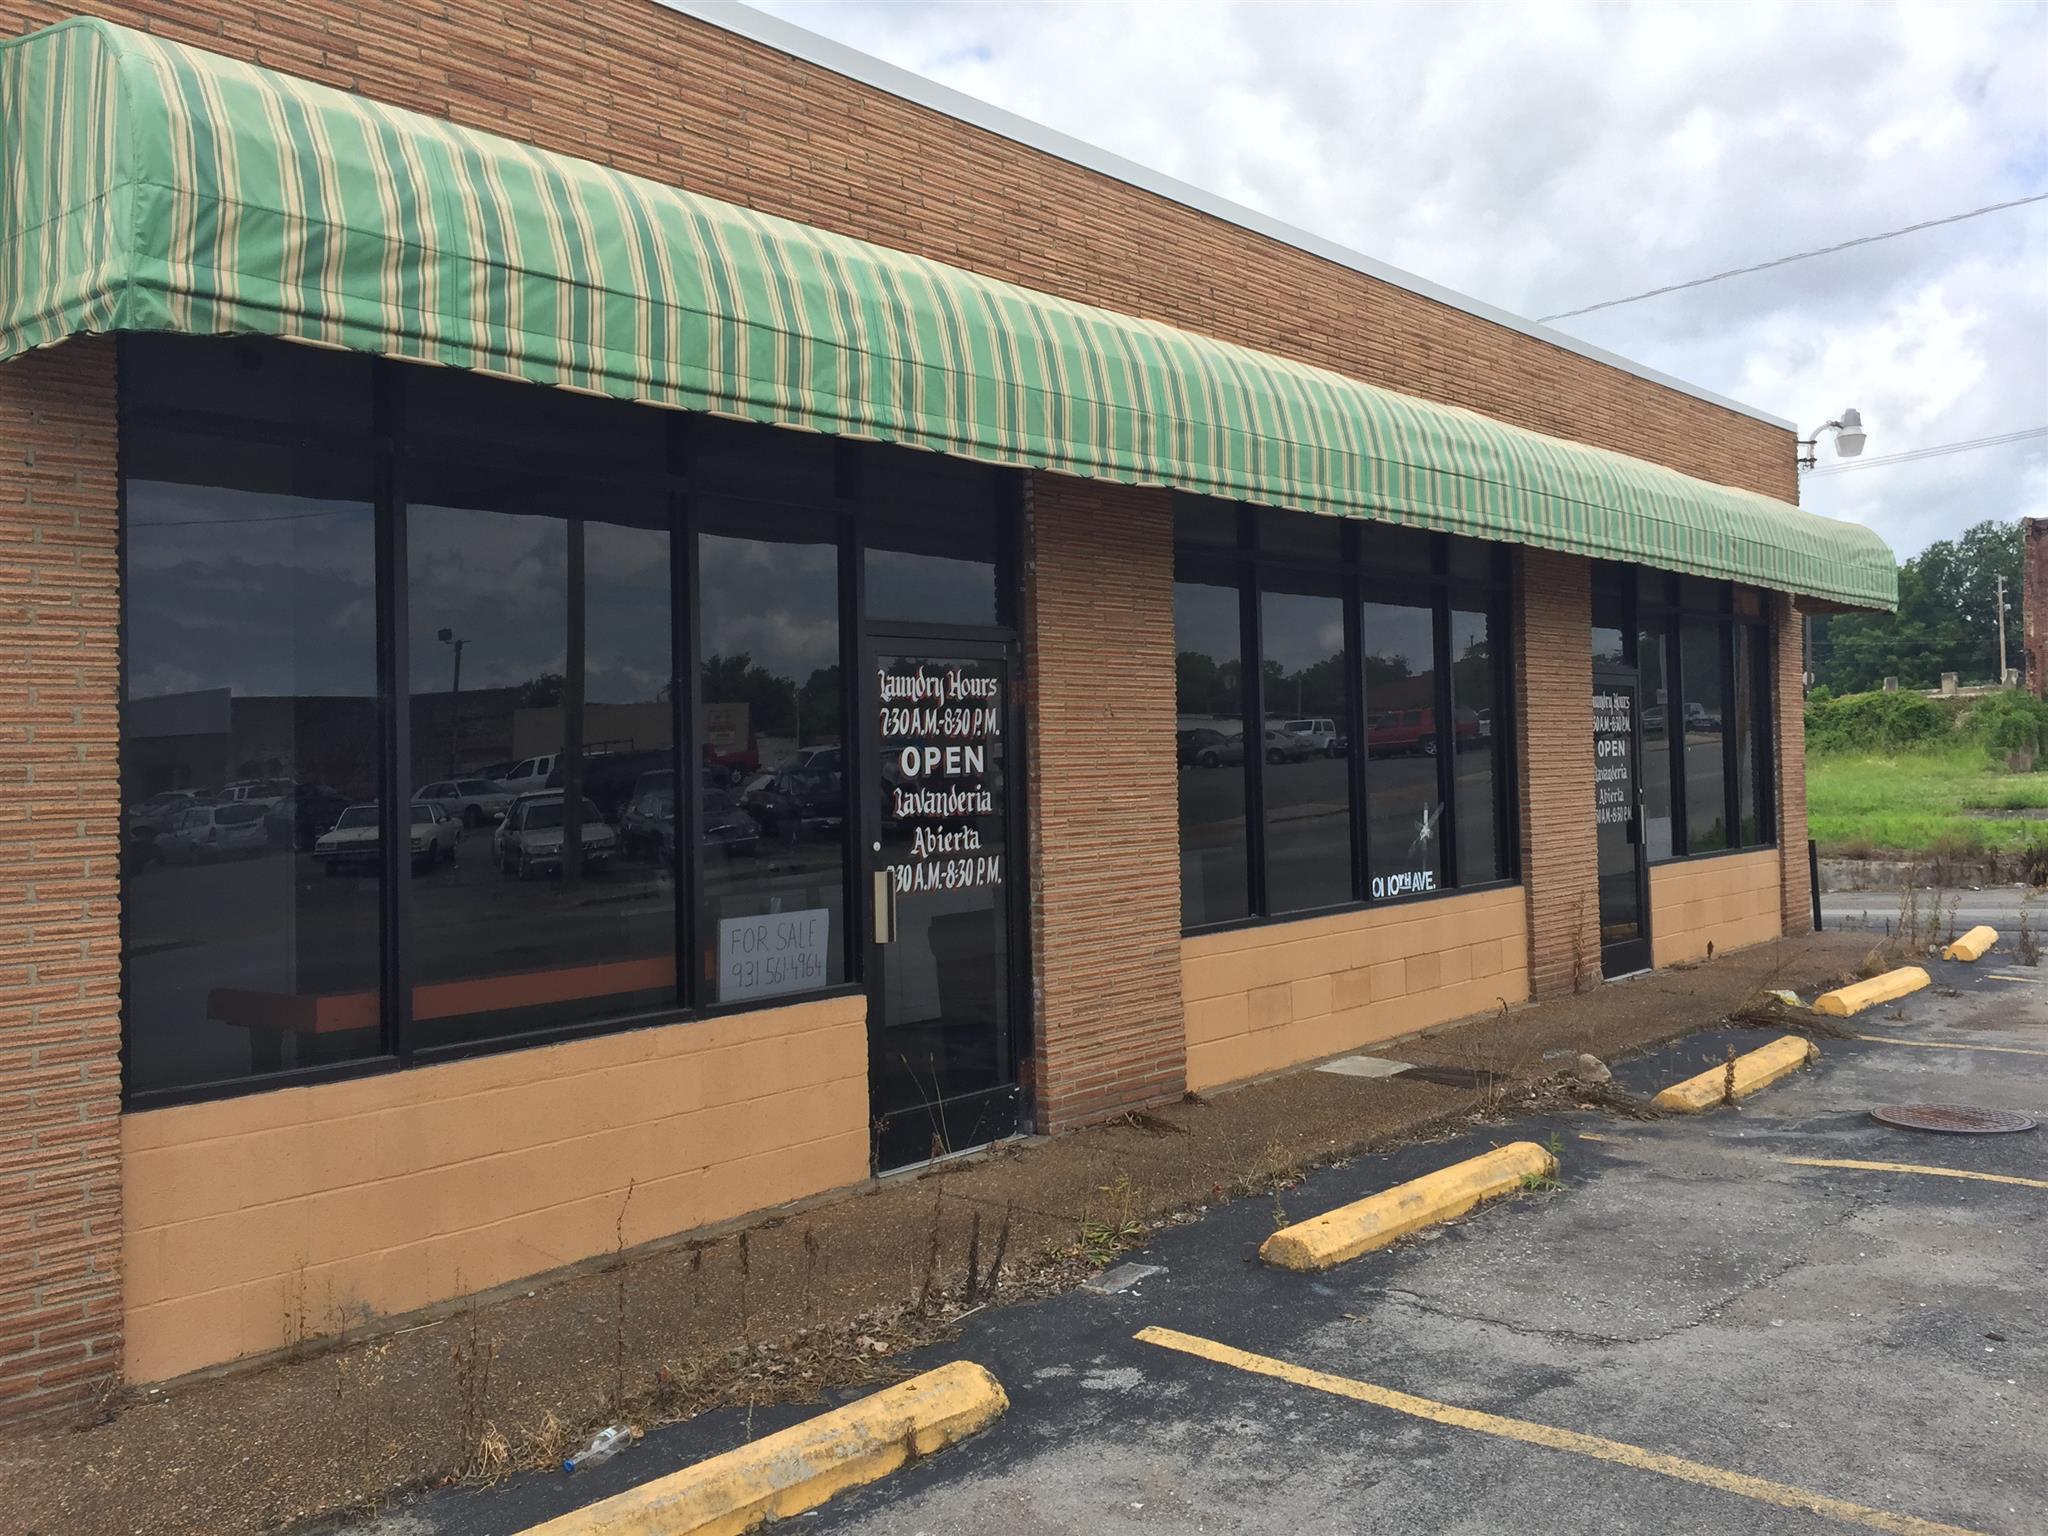 101 10th Ave E, Springfield, TN 37172